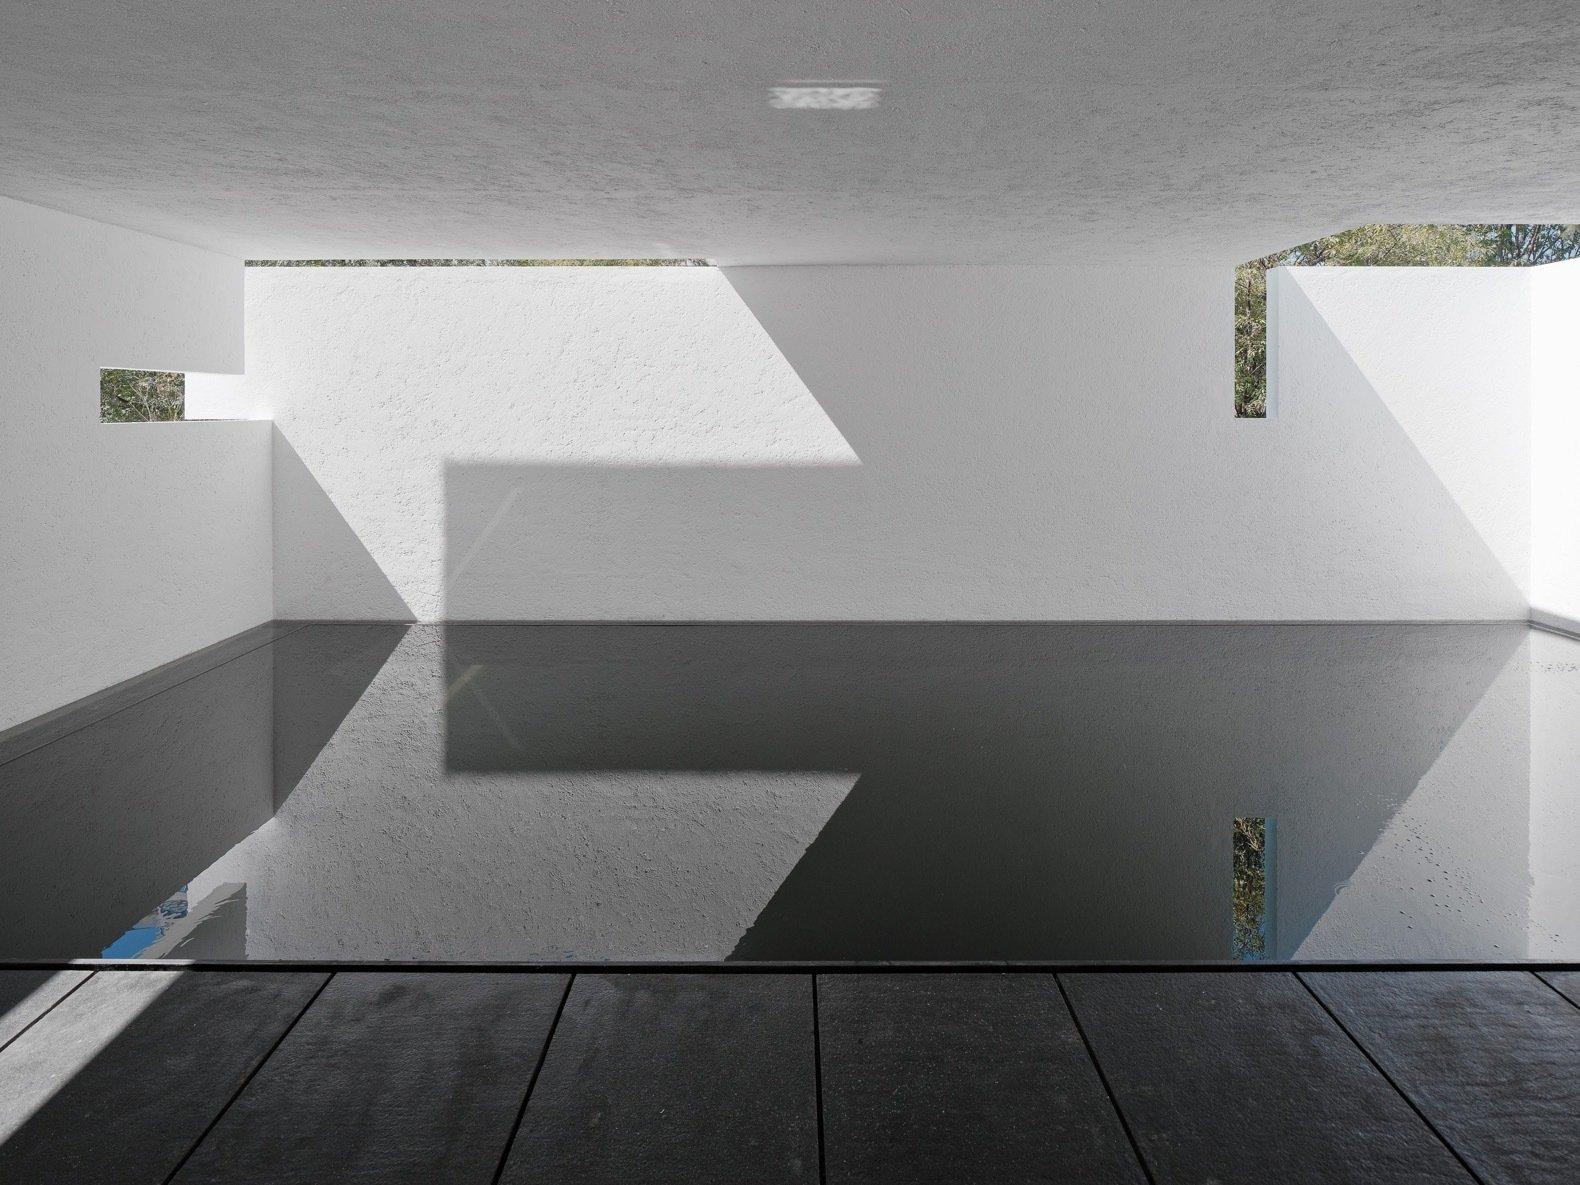 Rombo IV covered swimming pool